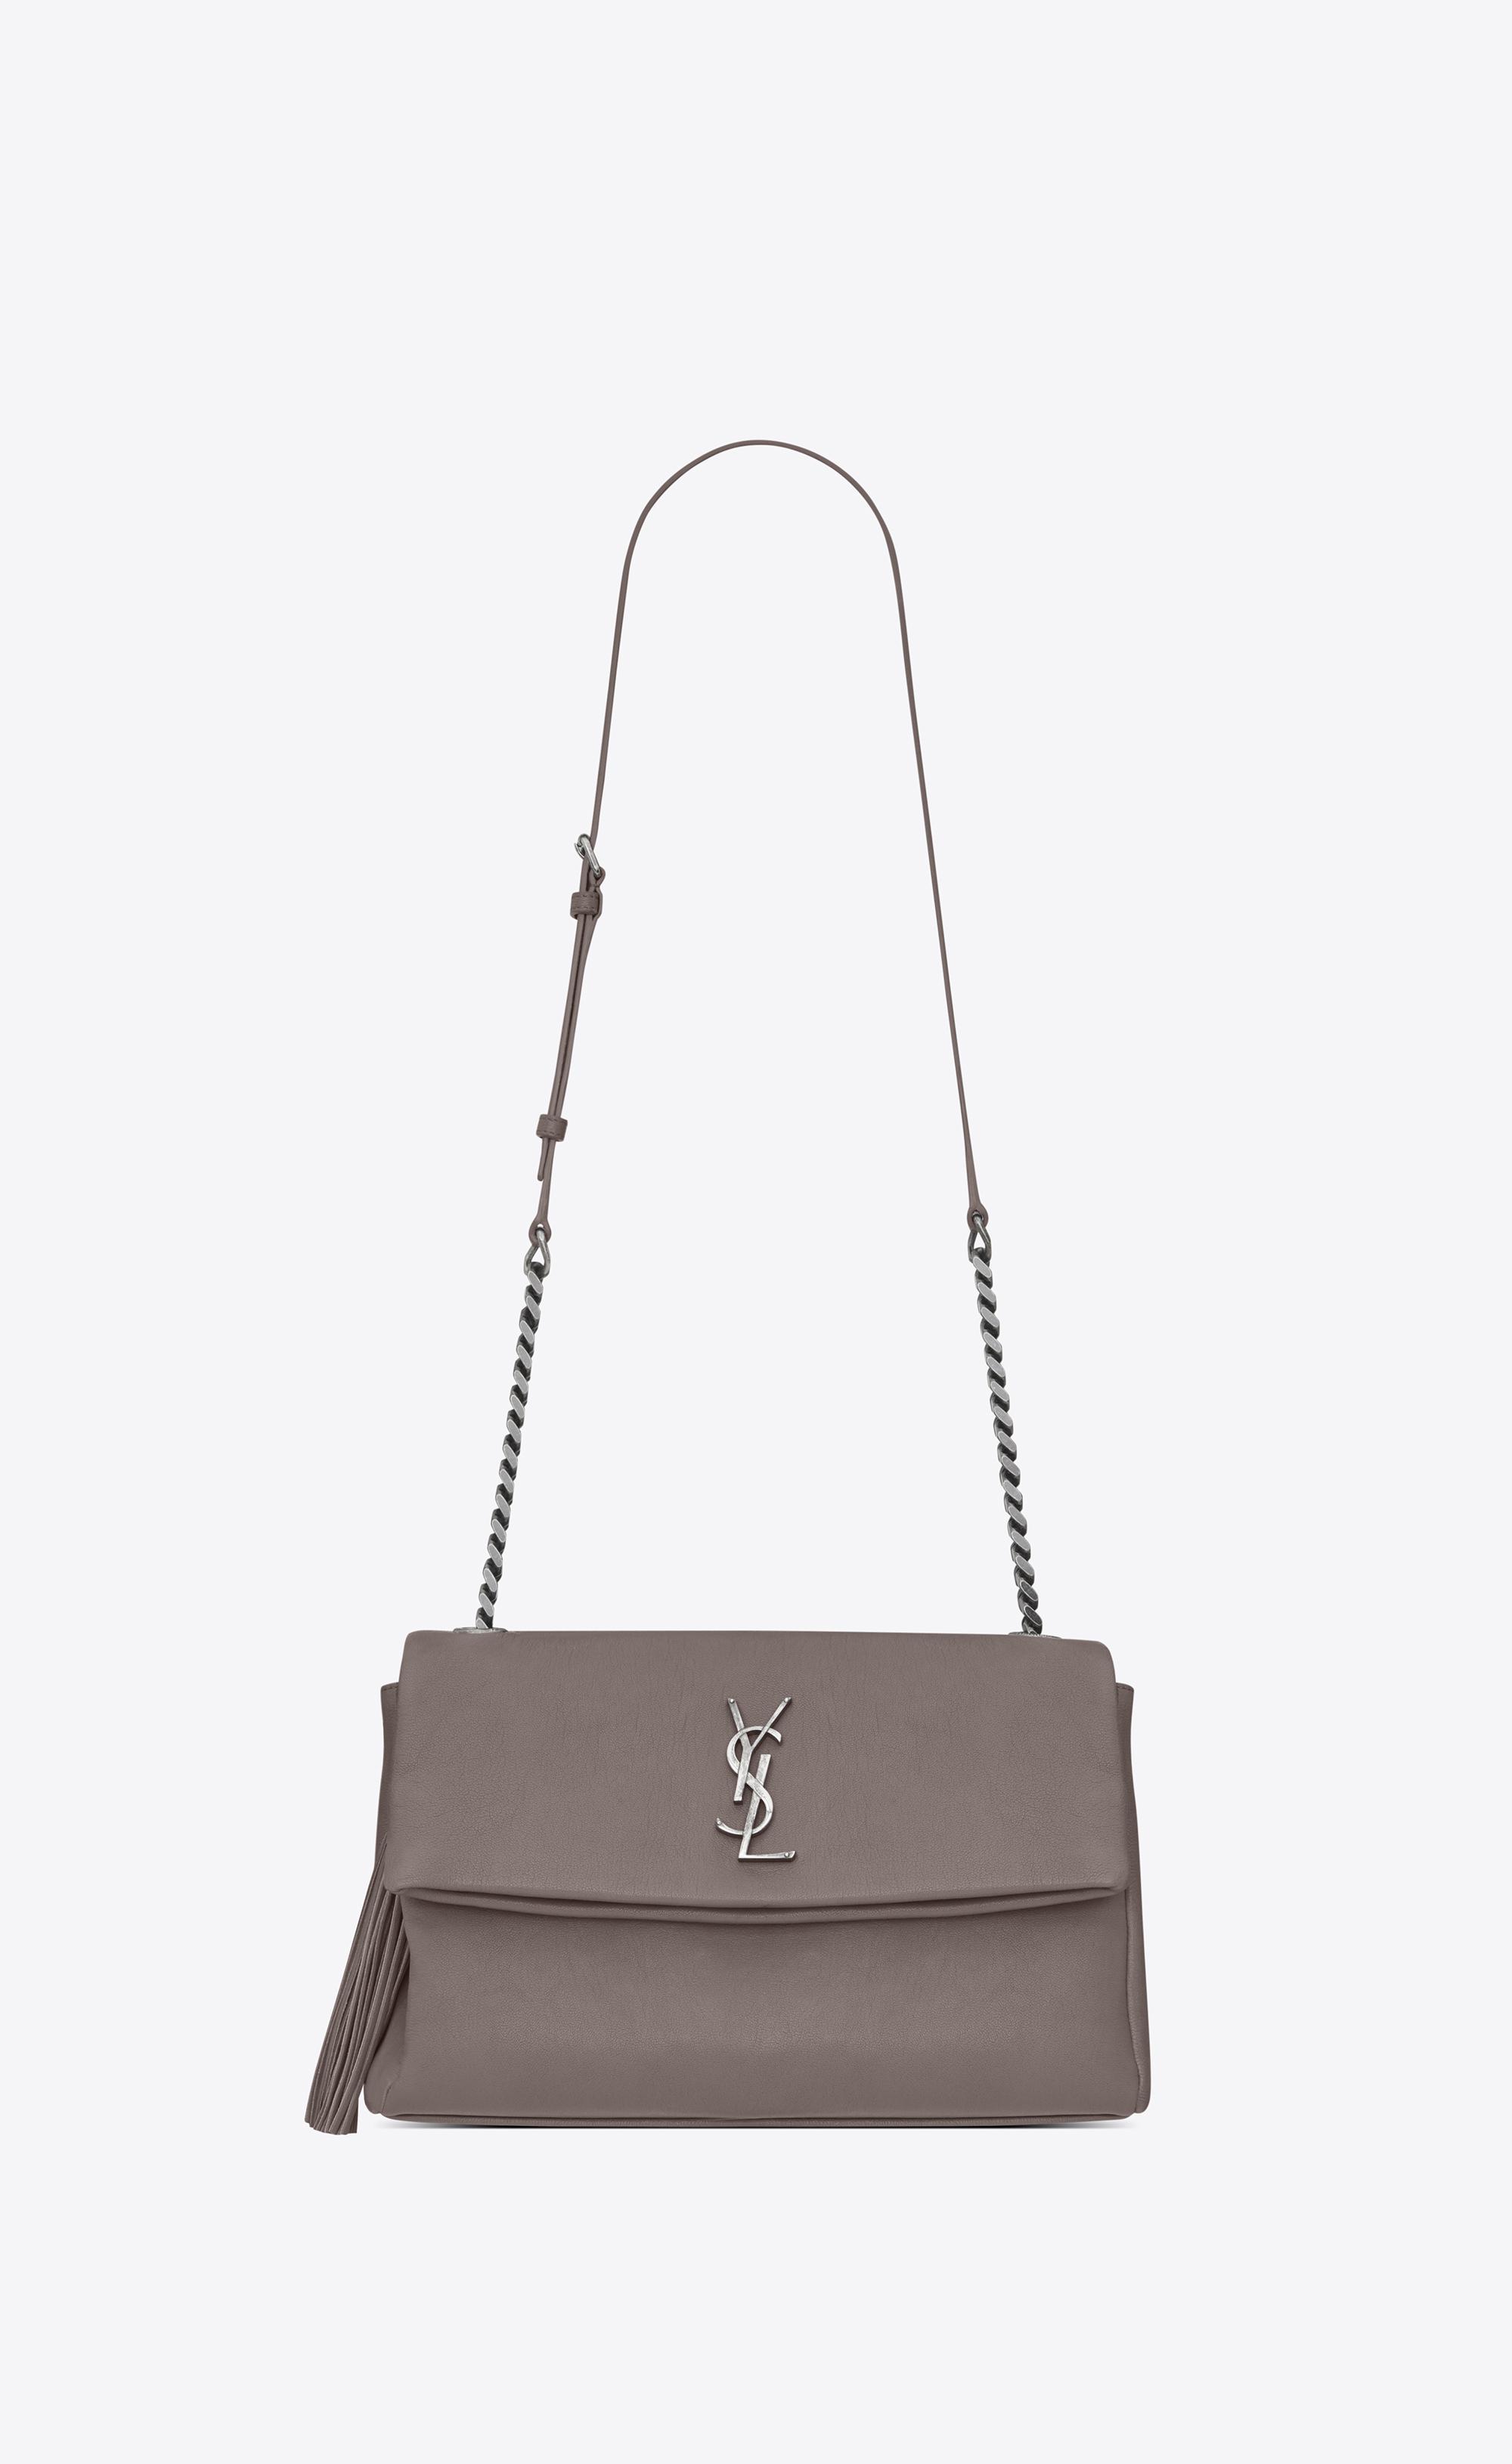 484d2a2c86d Saint Laurent Monogram West Hollywood Tassel Bag In Fog - Lyst